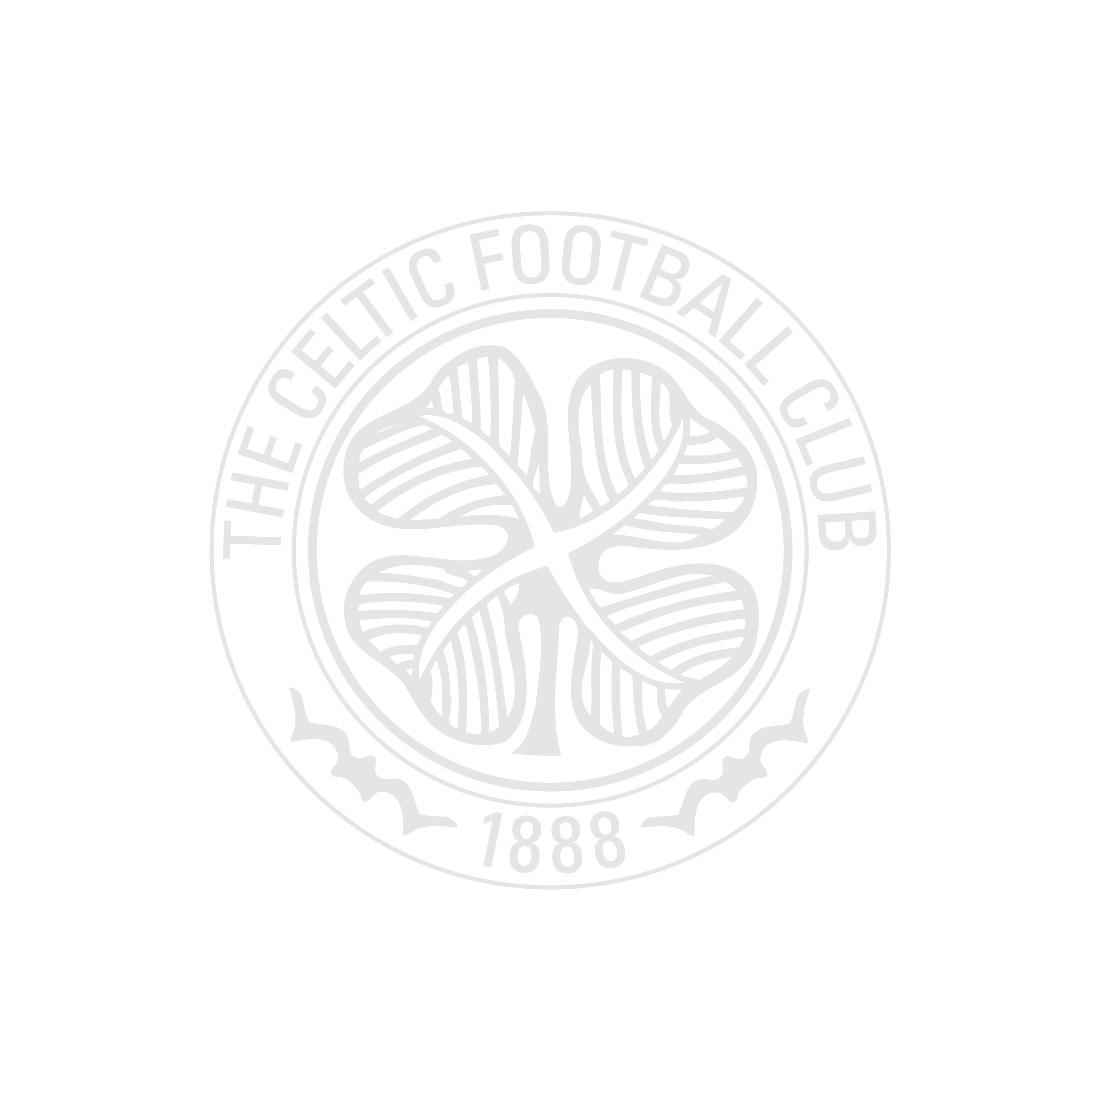 Celtic Mens Home Shirt 19/20 with Sponsor